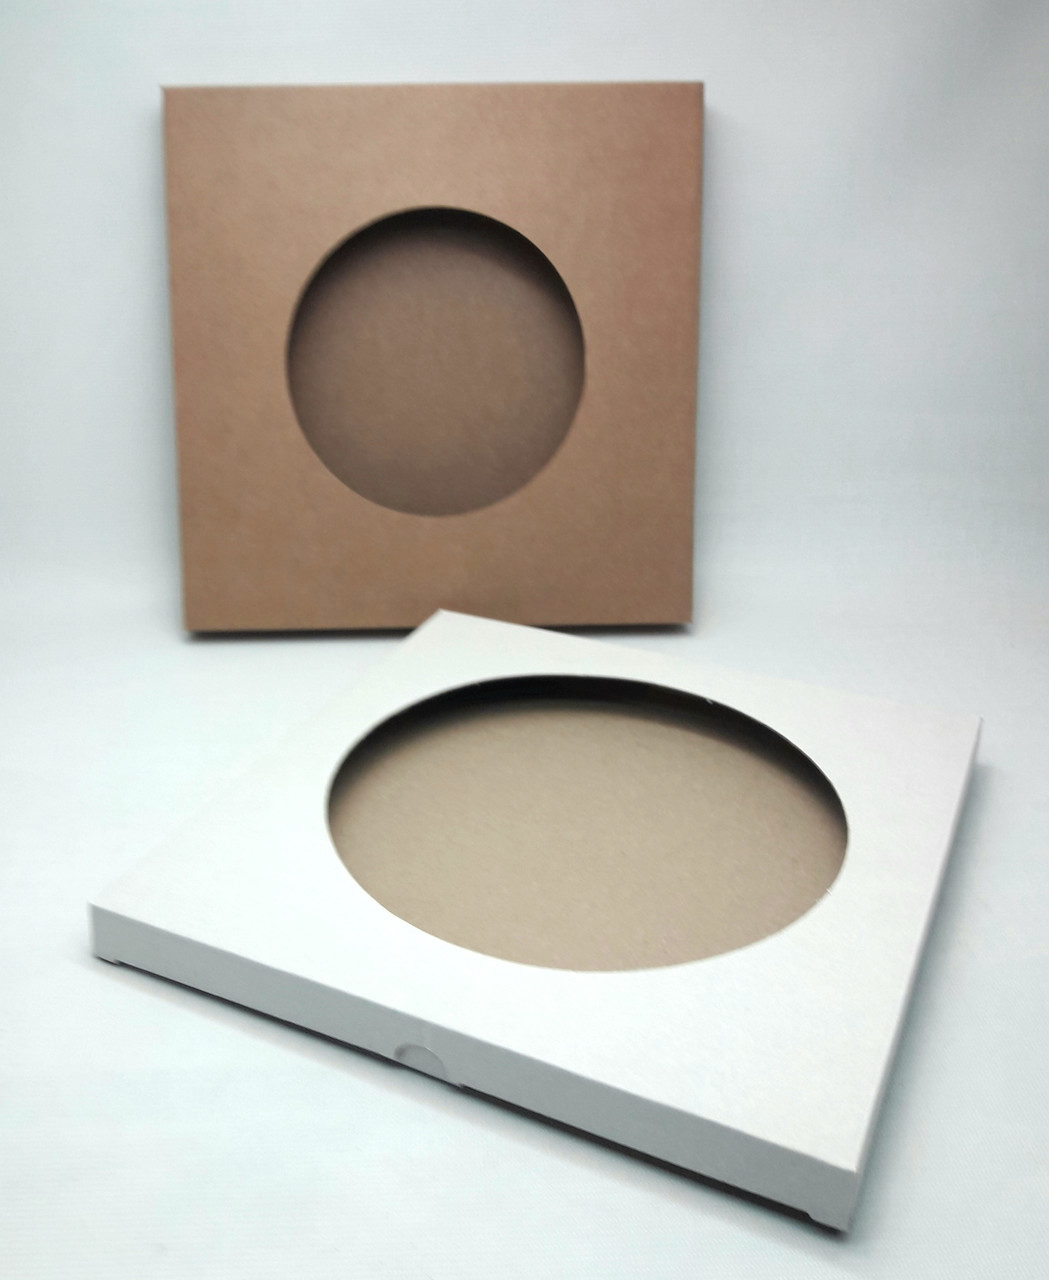 УПАКОВКА под тарелку,  250Х20Х250 (диаметр окошка 250 мм. )